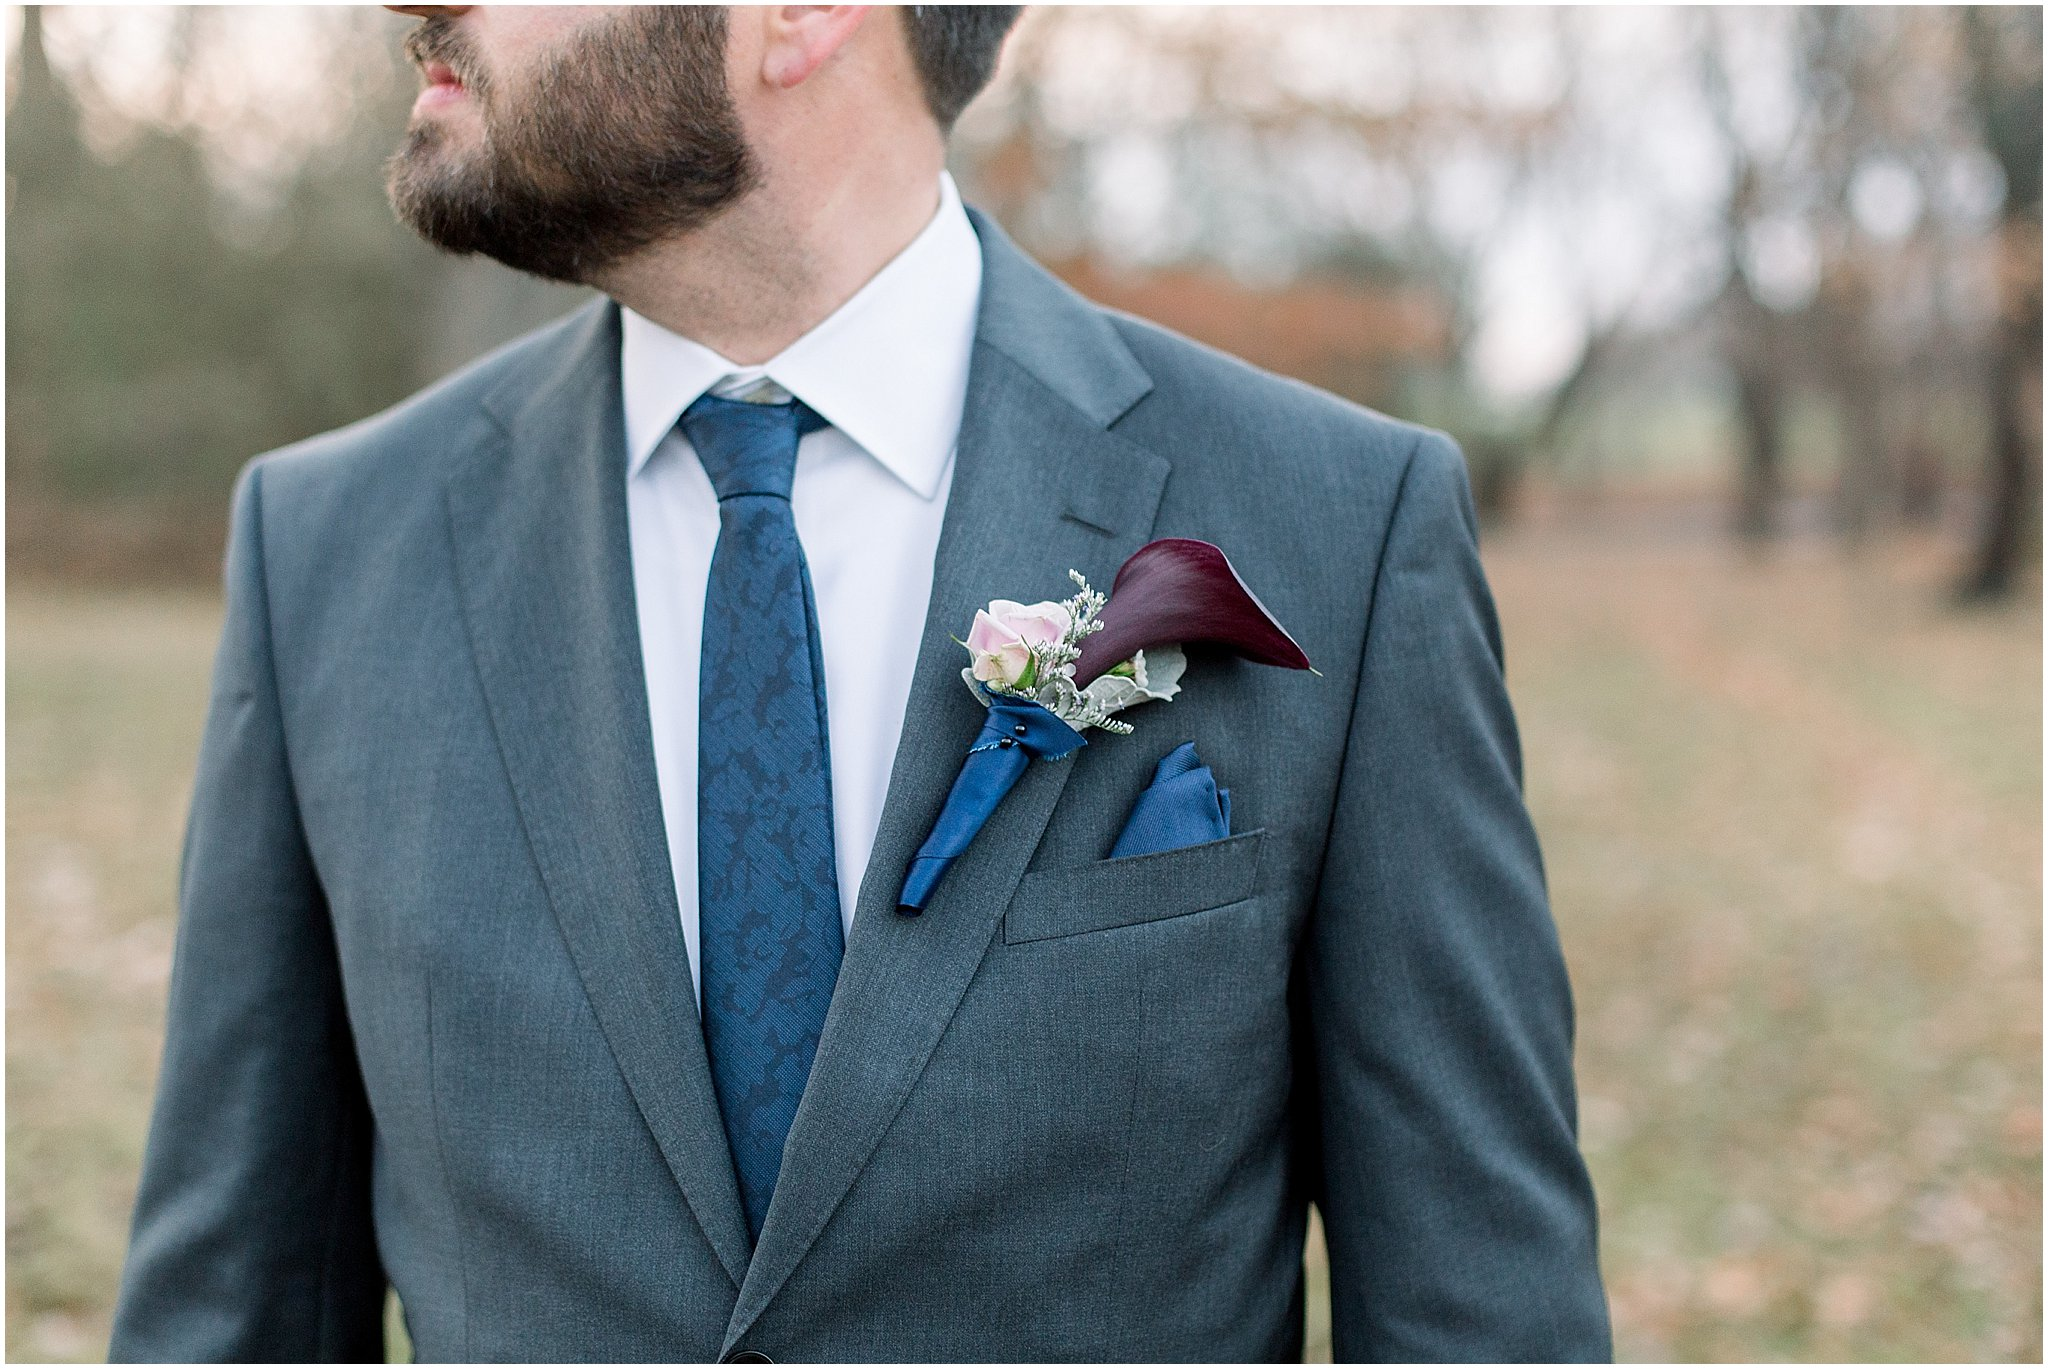 Hyatt-Lodge-Mcdonald-Campus-Wedding_0049.jpg